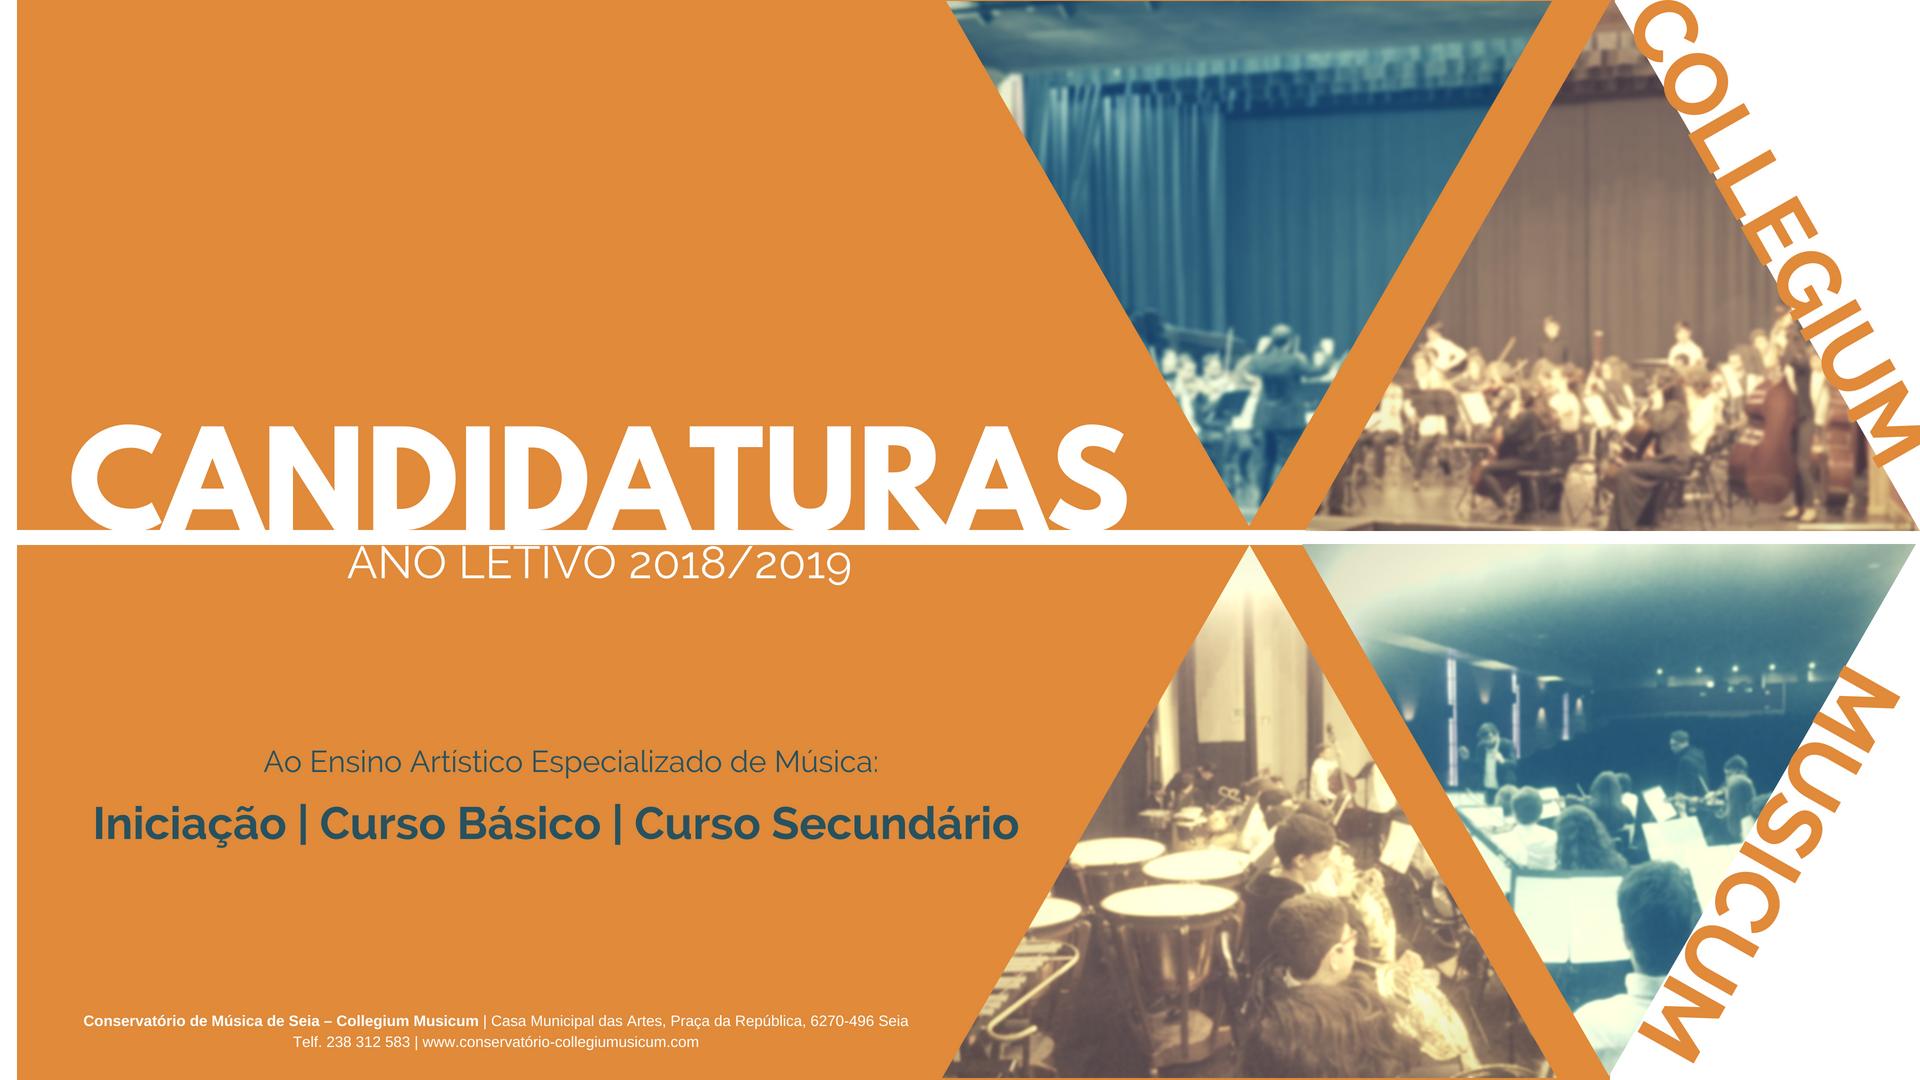 Candidaturas 2018-2019